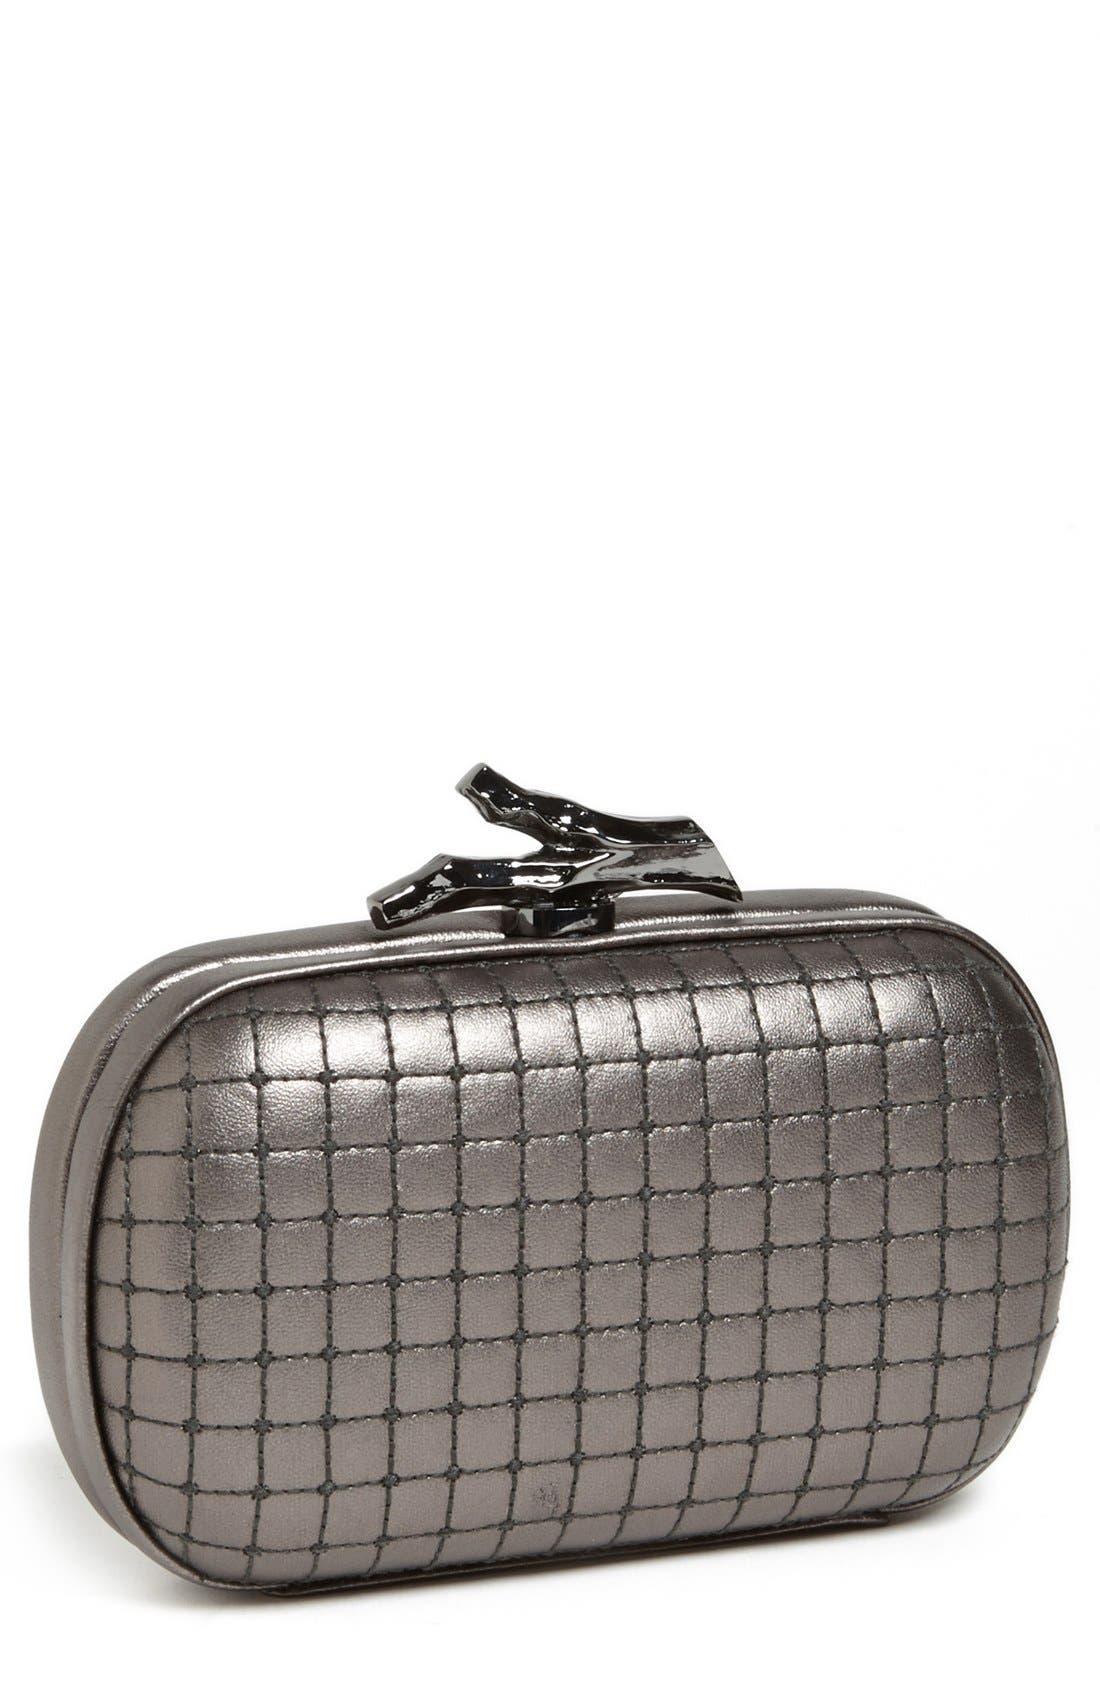 Alternate Image 1 Selected - Diane von Furstenberg 'Lytton - Small' Quilted Metallic Leather Clutch